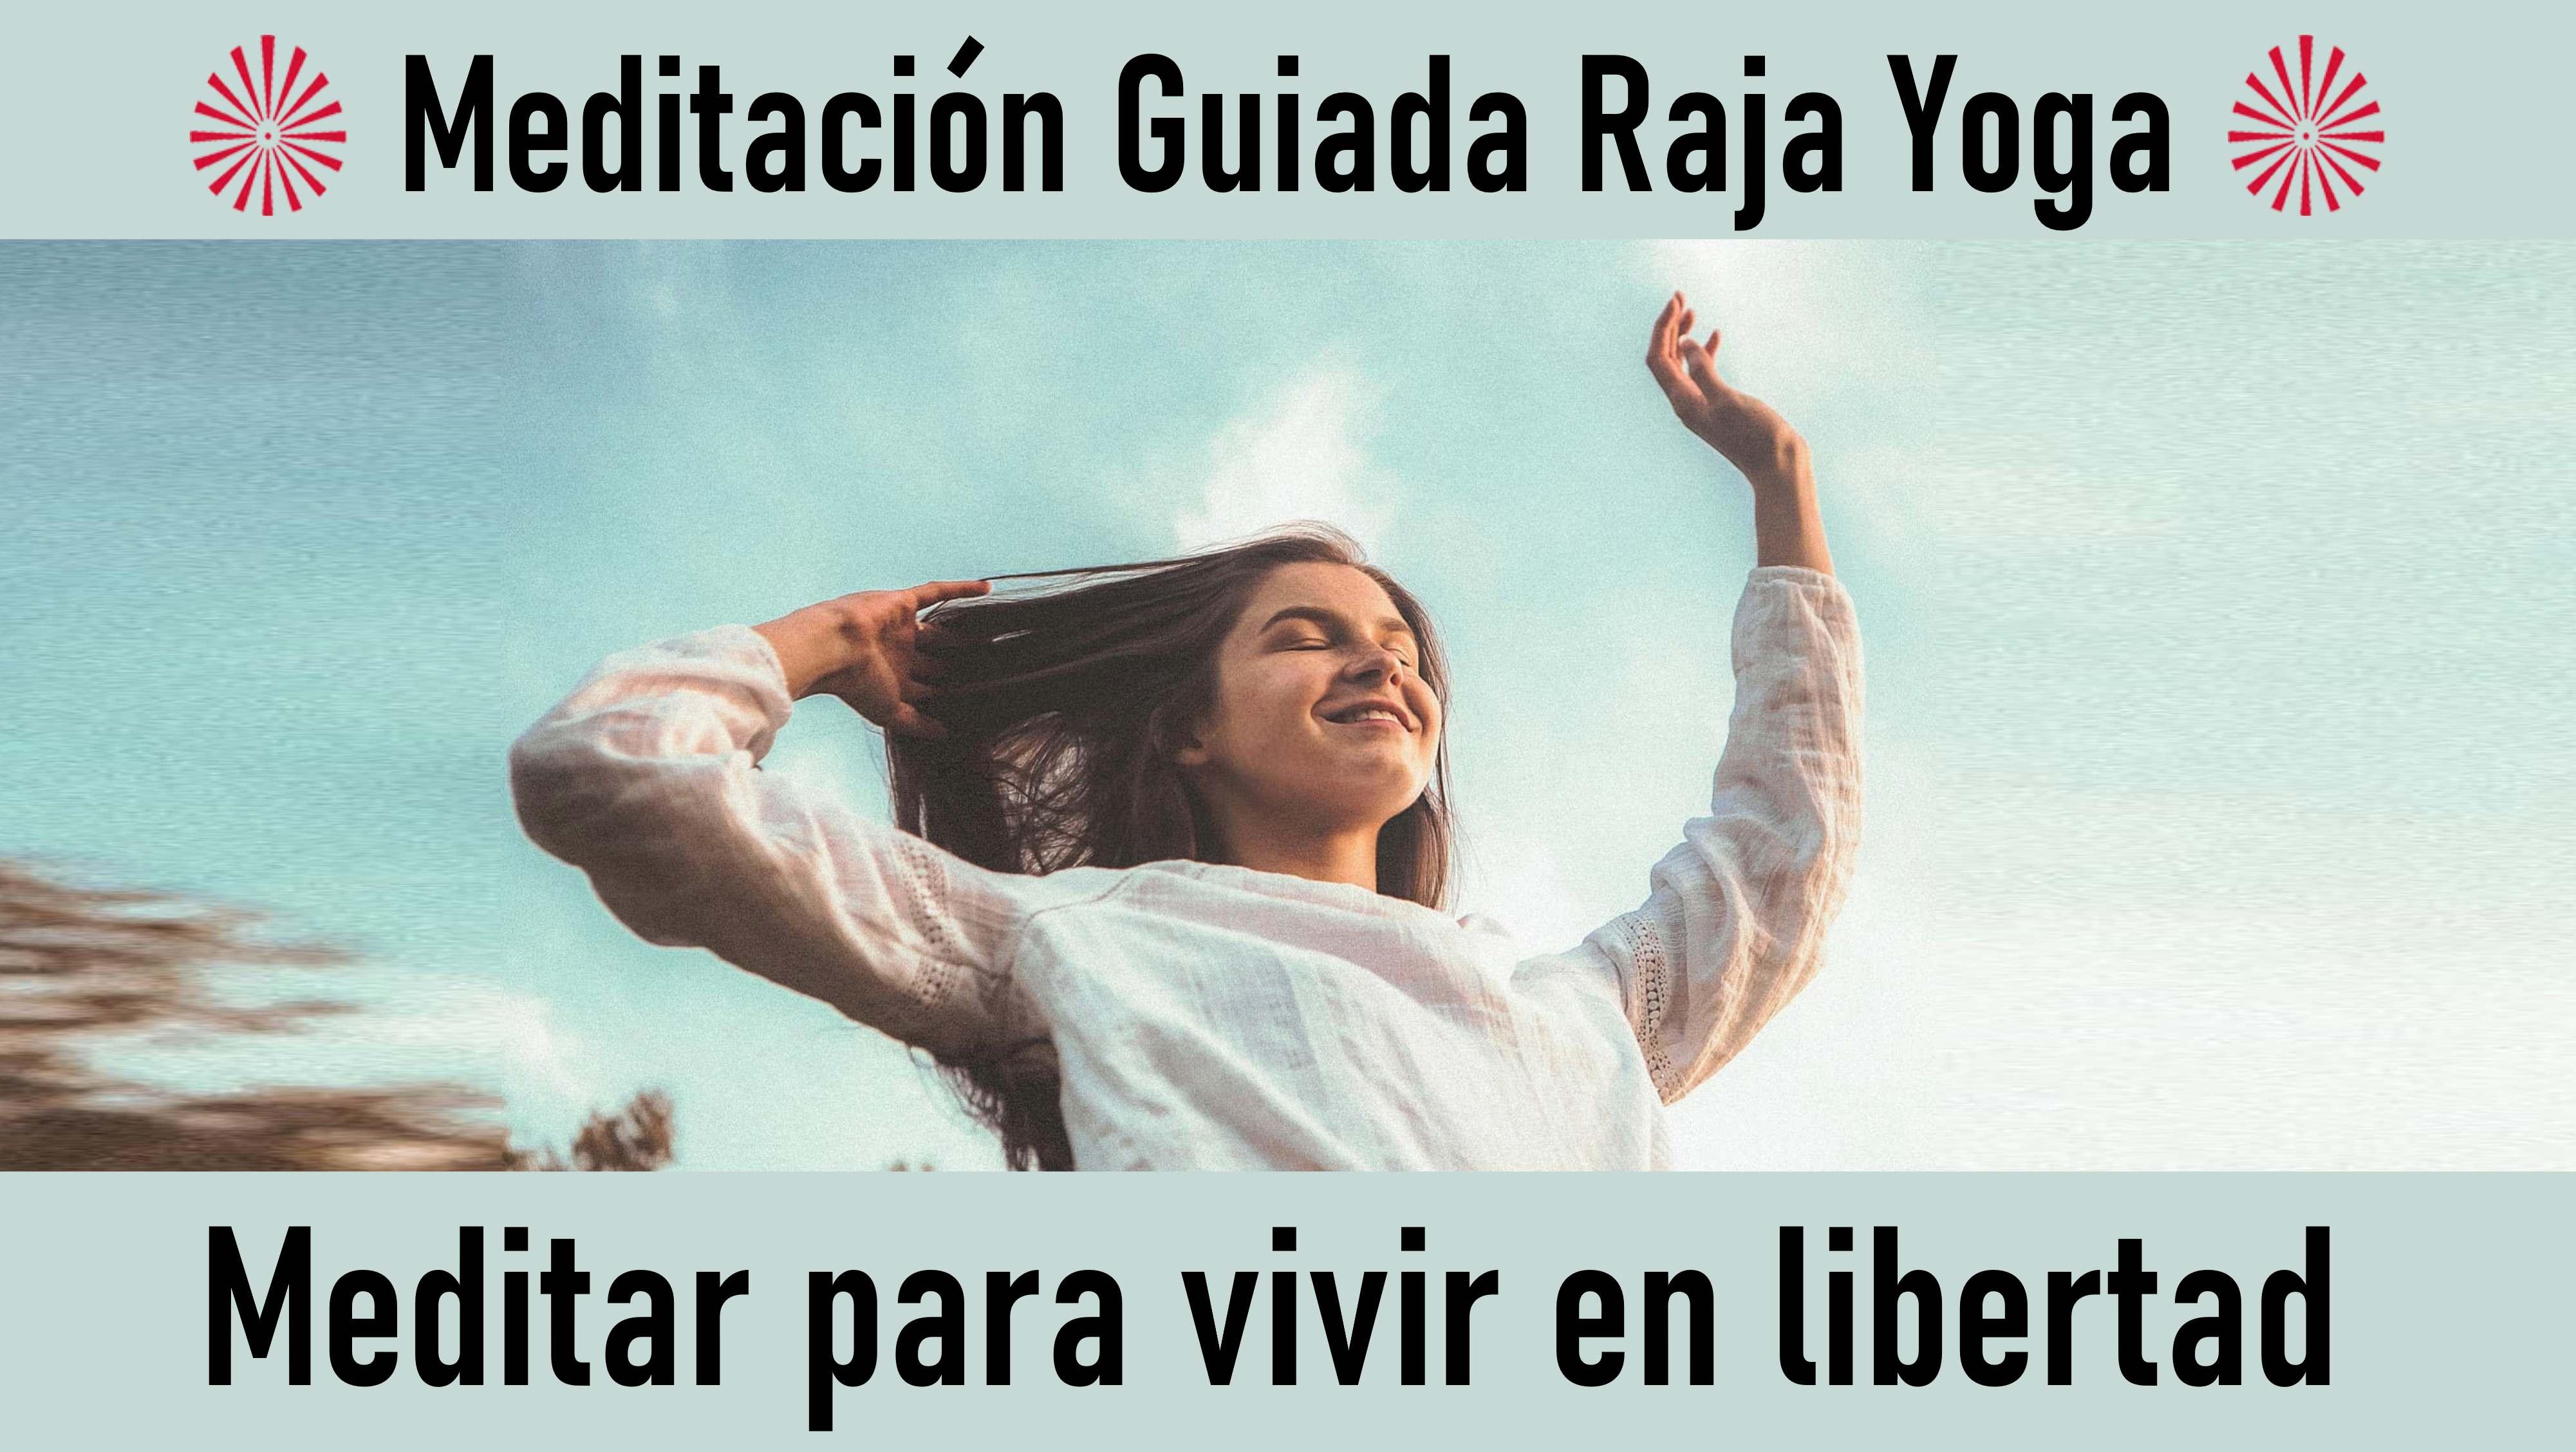 Meditación Raja Yoga: Meditar para vivir en libertad (26 Agosto 2020) On-line desde Sevilla